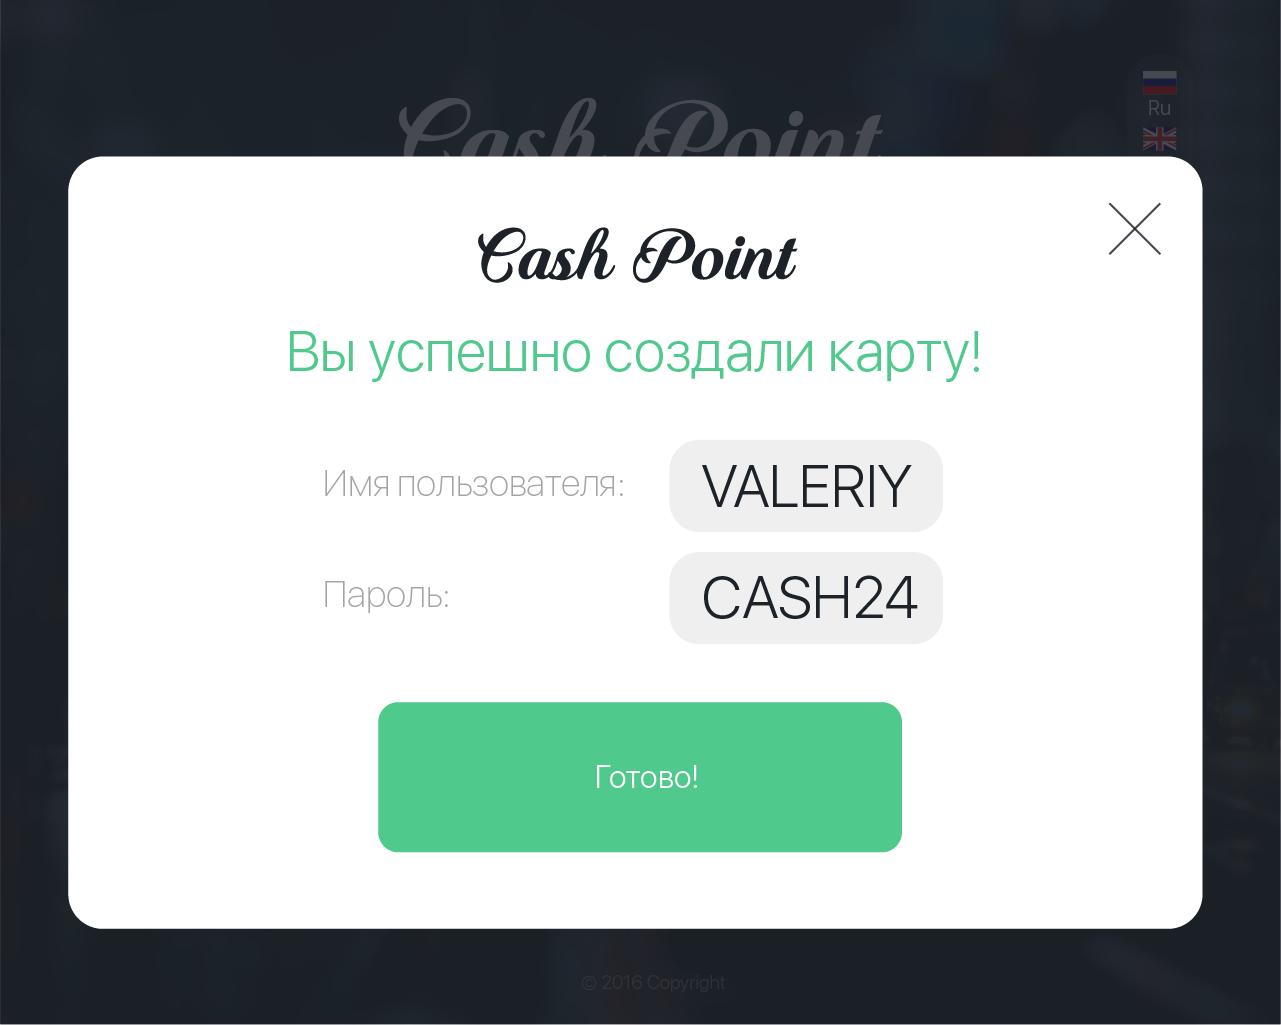 Терминал Cash Point